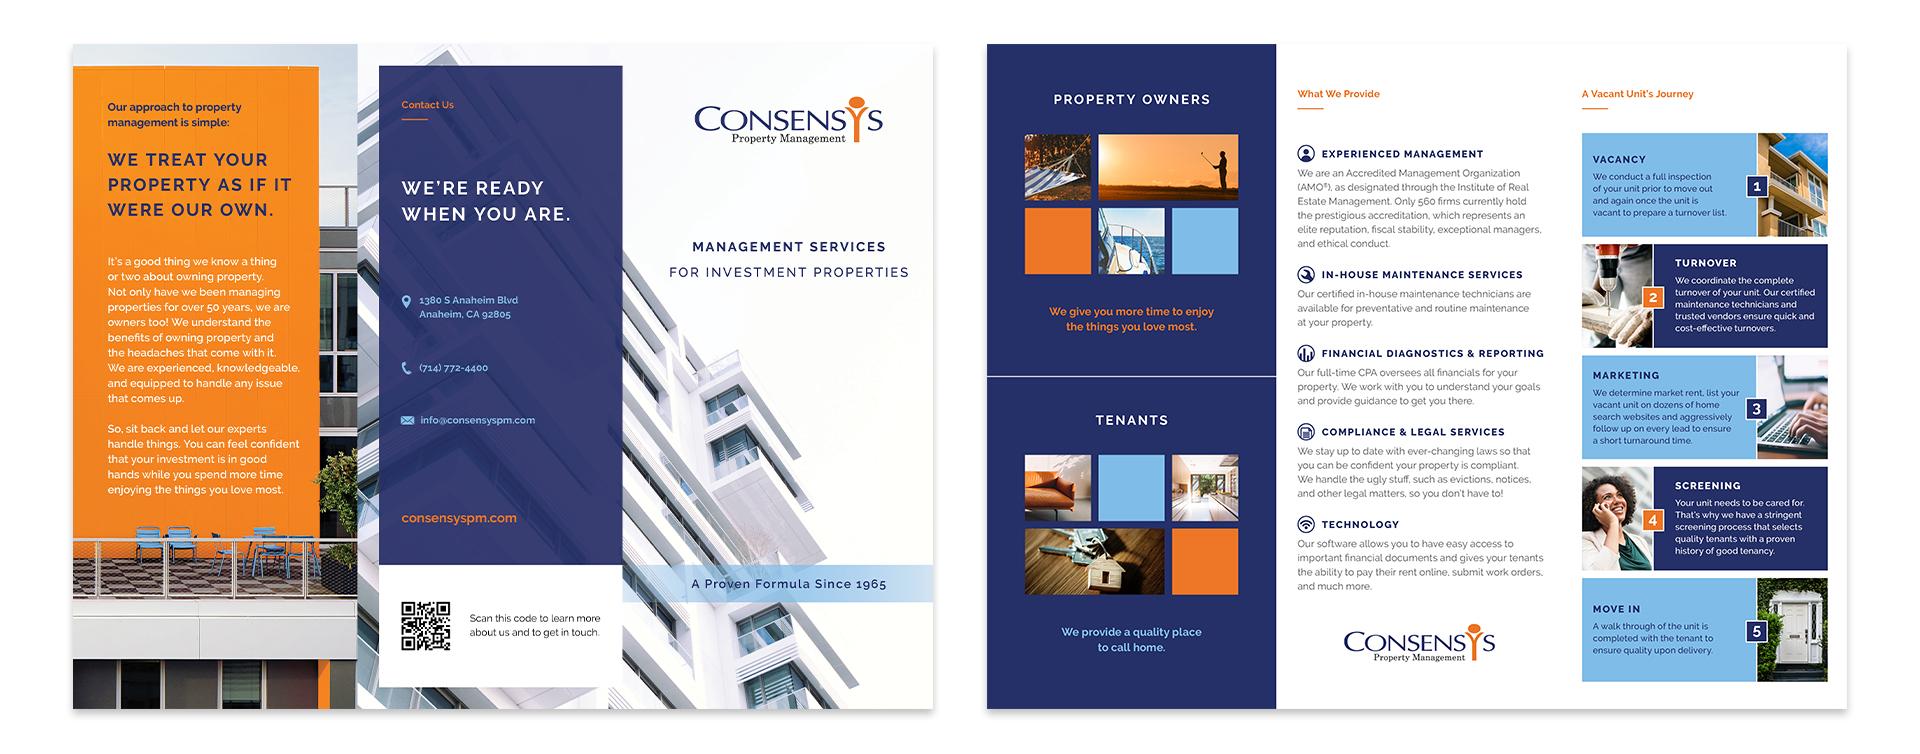 ConsensYs tri-fold brochure design